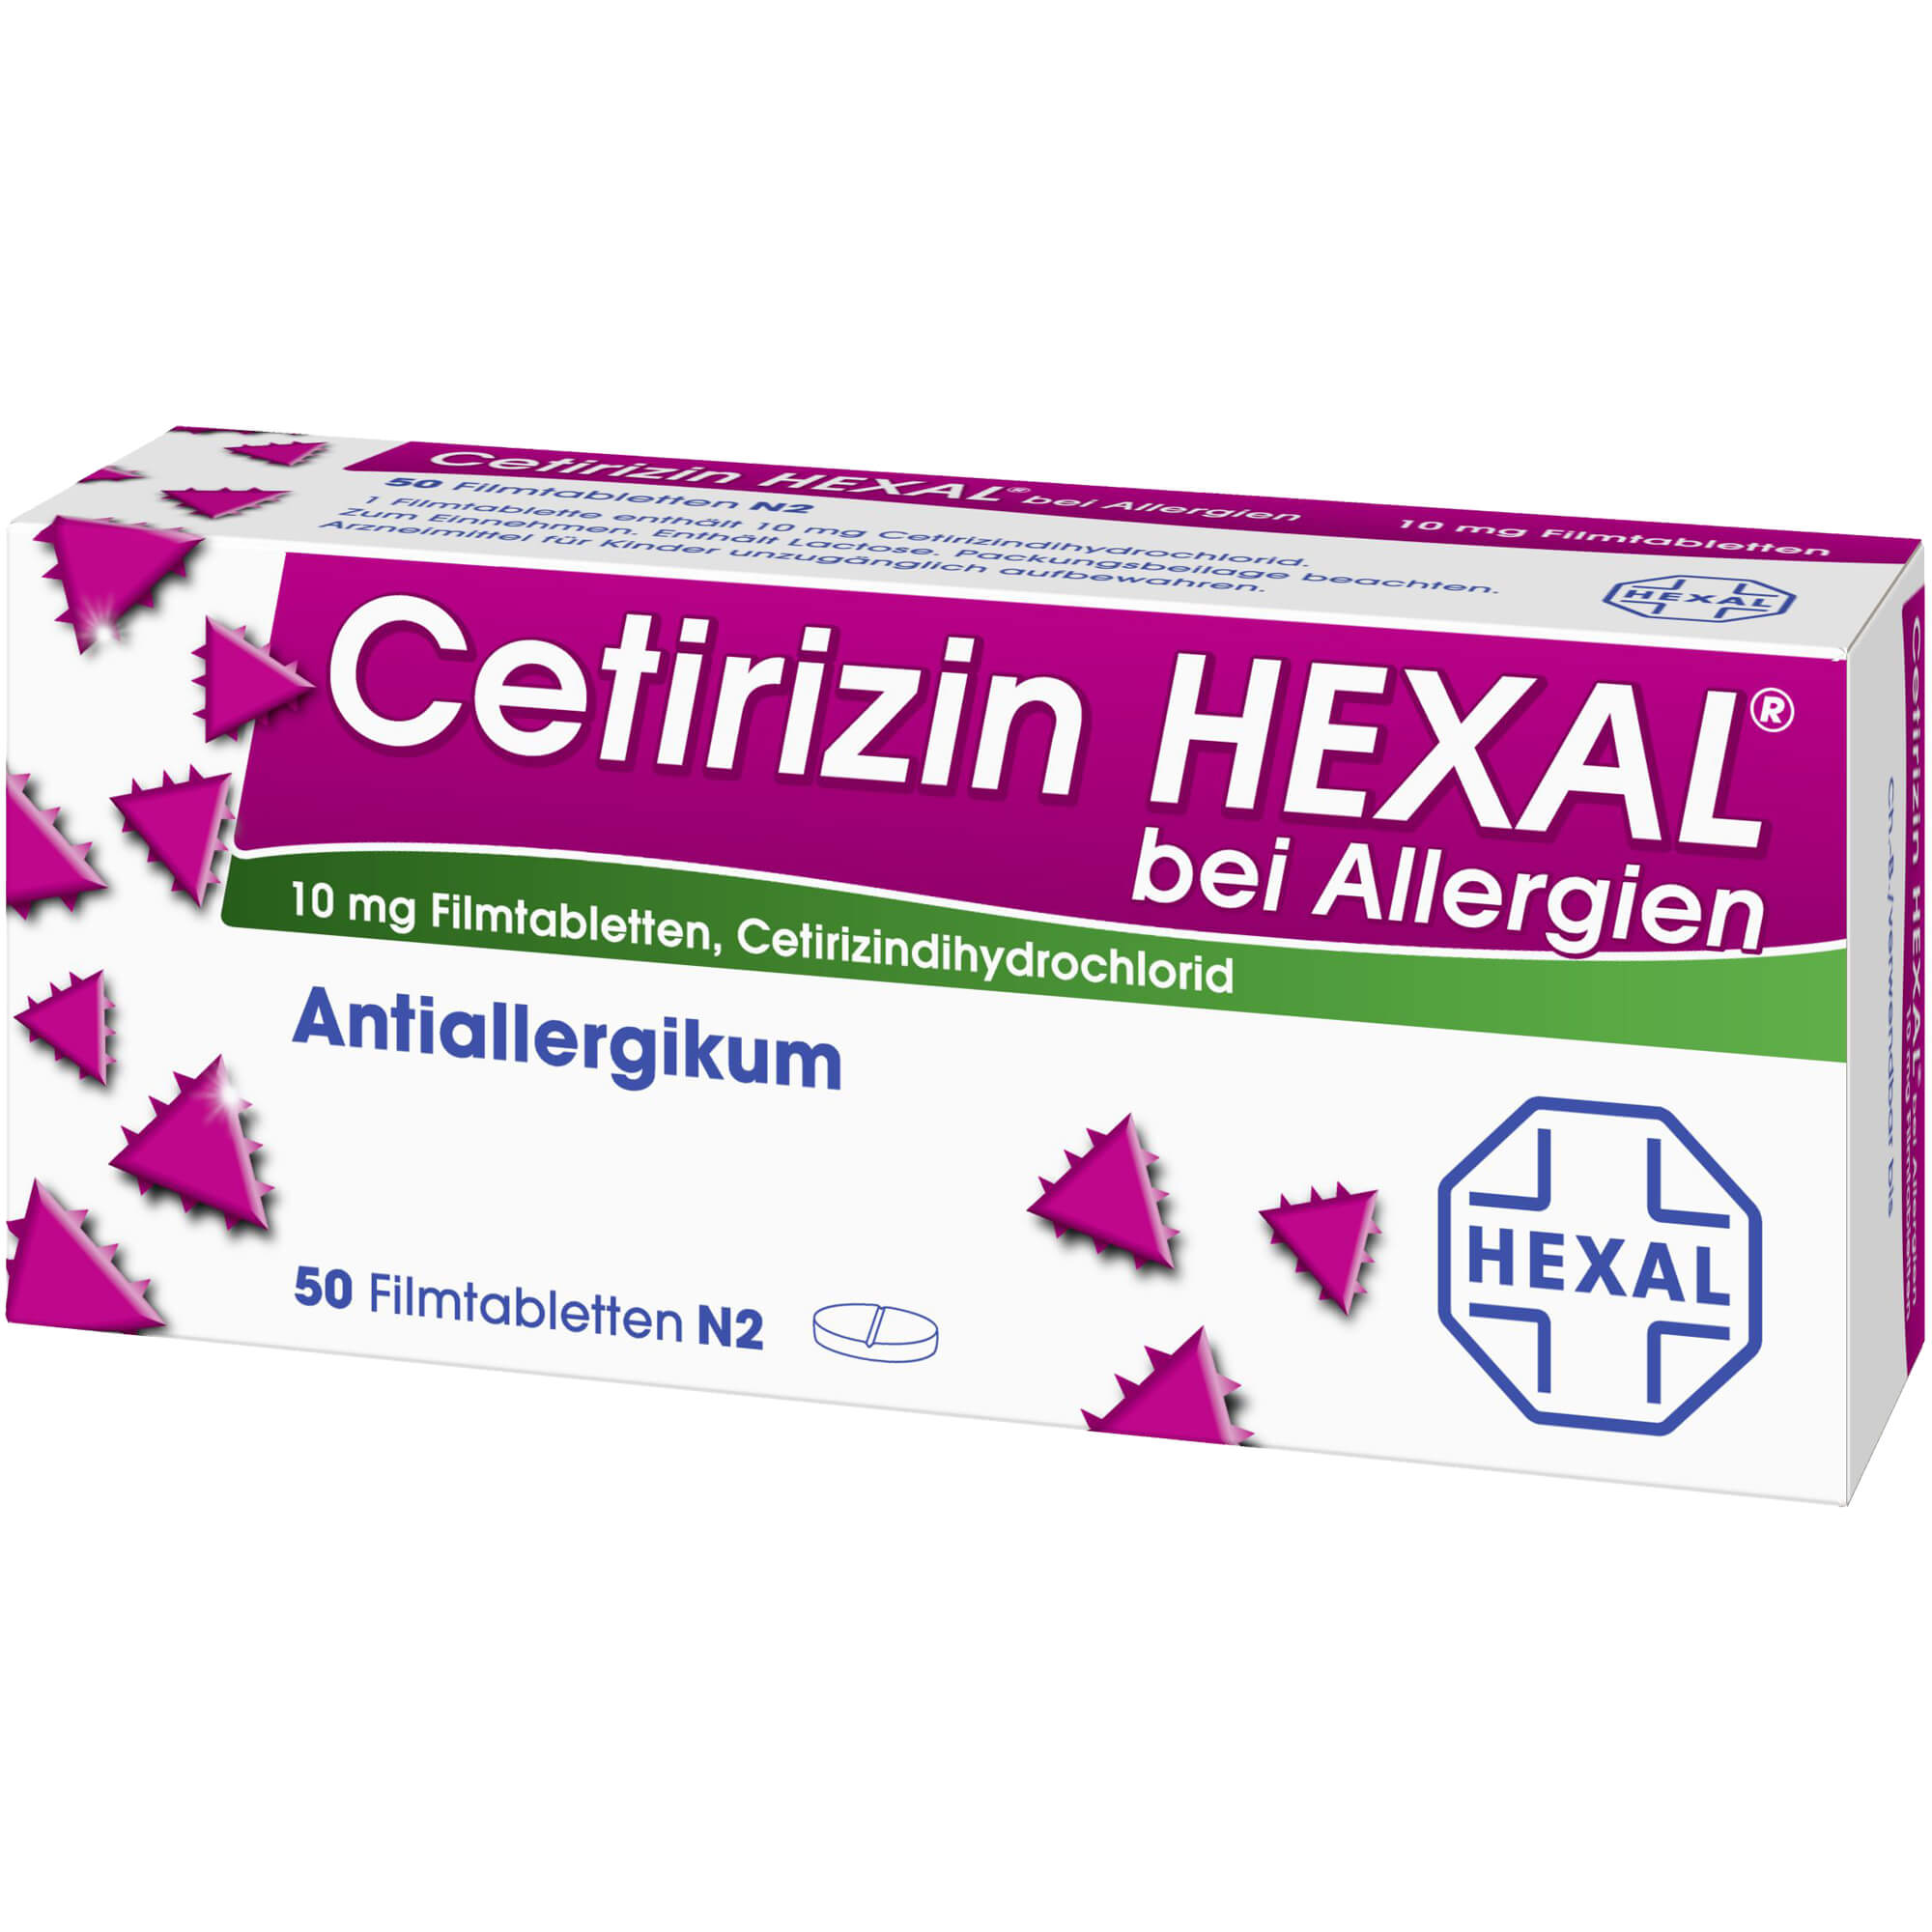 CETIRIZIN-HEXAL-Filmtabletten-bei-Allergien